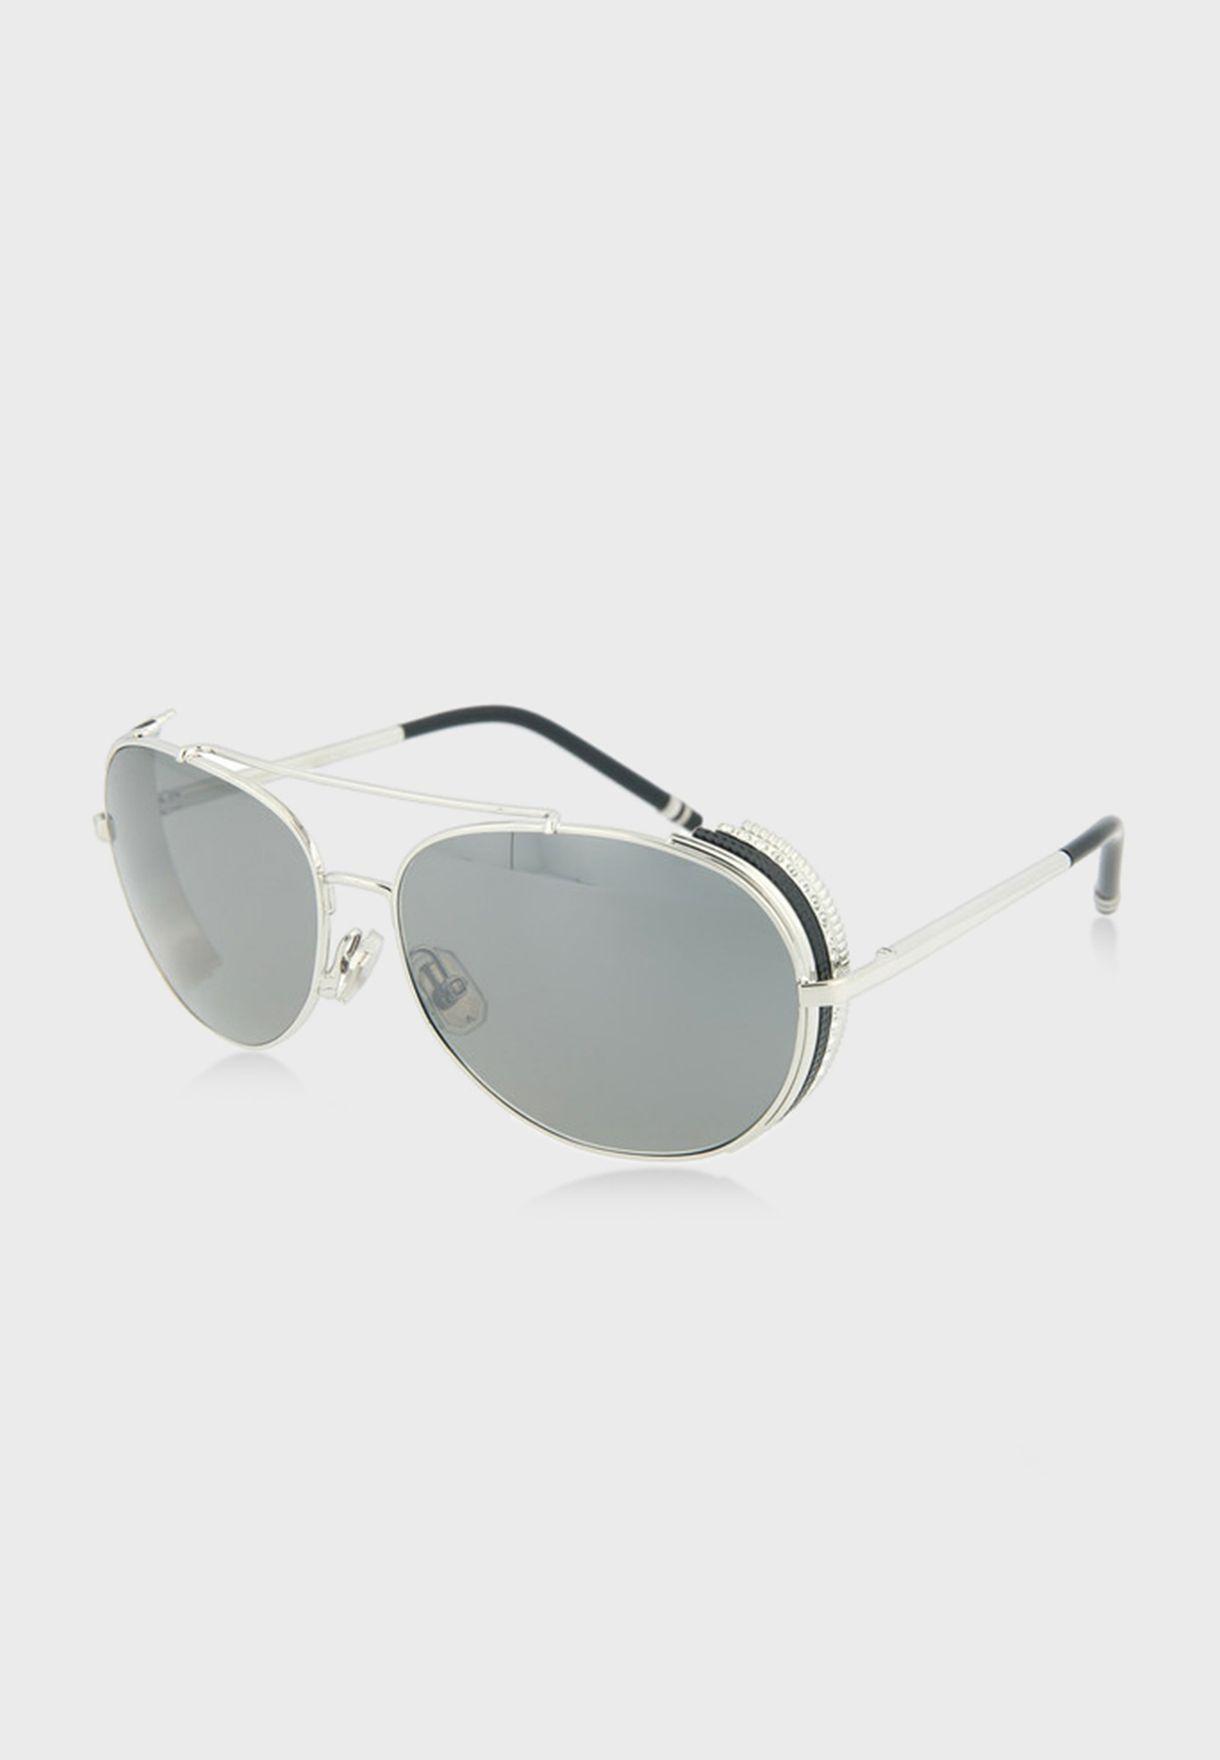 Novelty Aviator Sunglasses